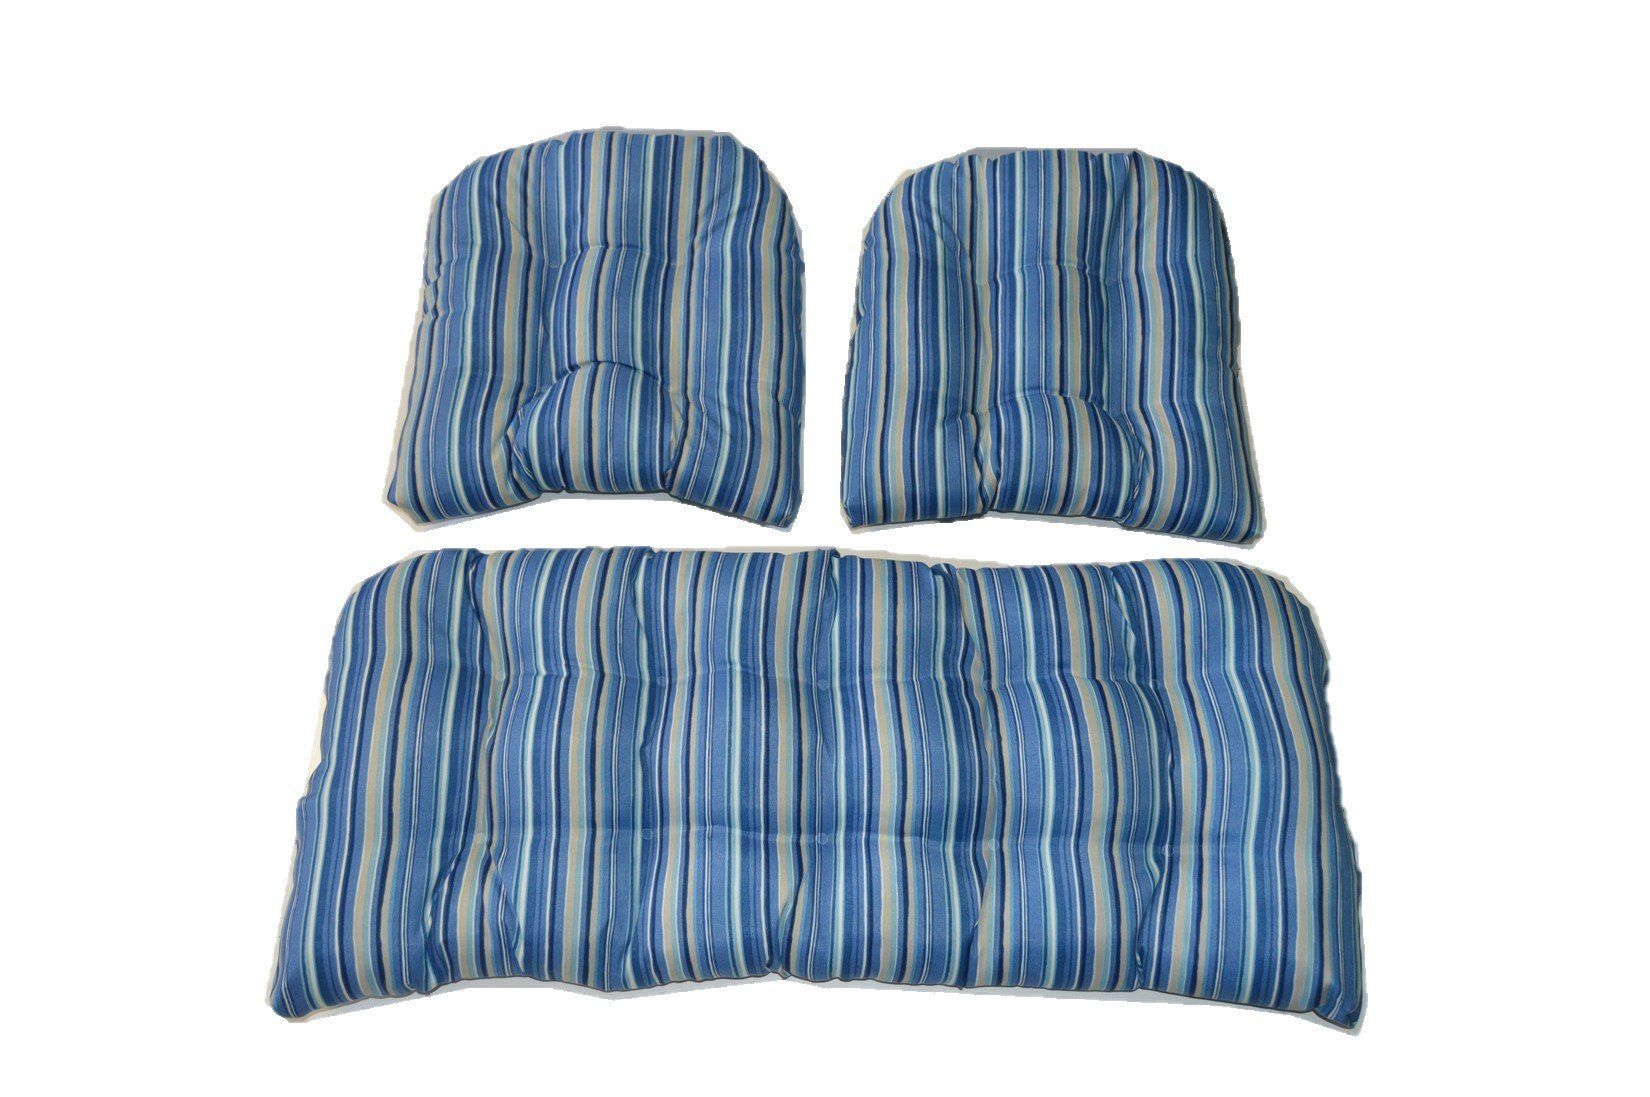 3 Piece Wicker Cushion Set - Indoor / Outdoor Sapphire Blue, Tan Stripe Wicker Loveseat Settee & 2 Matching Chair Cushions